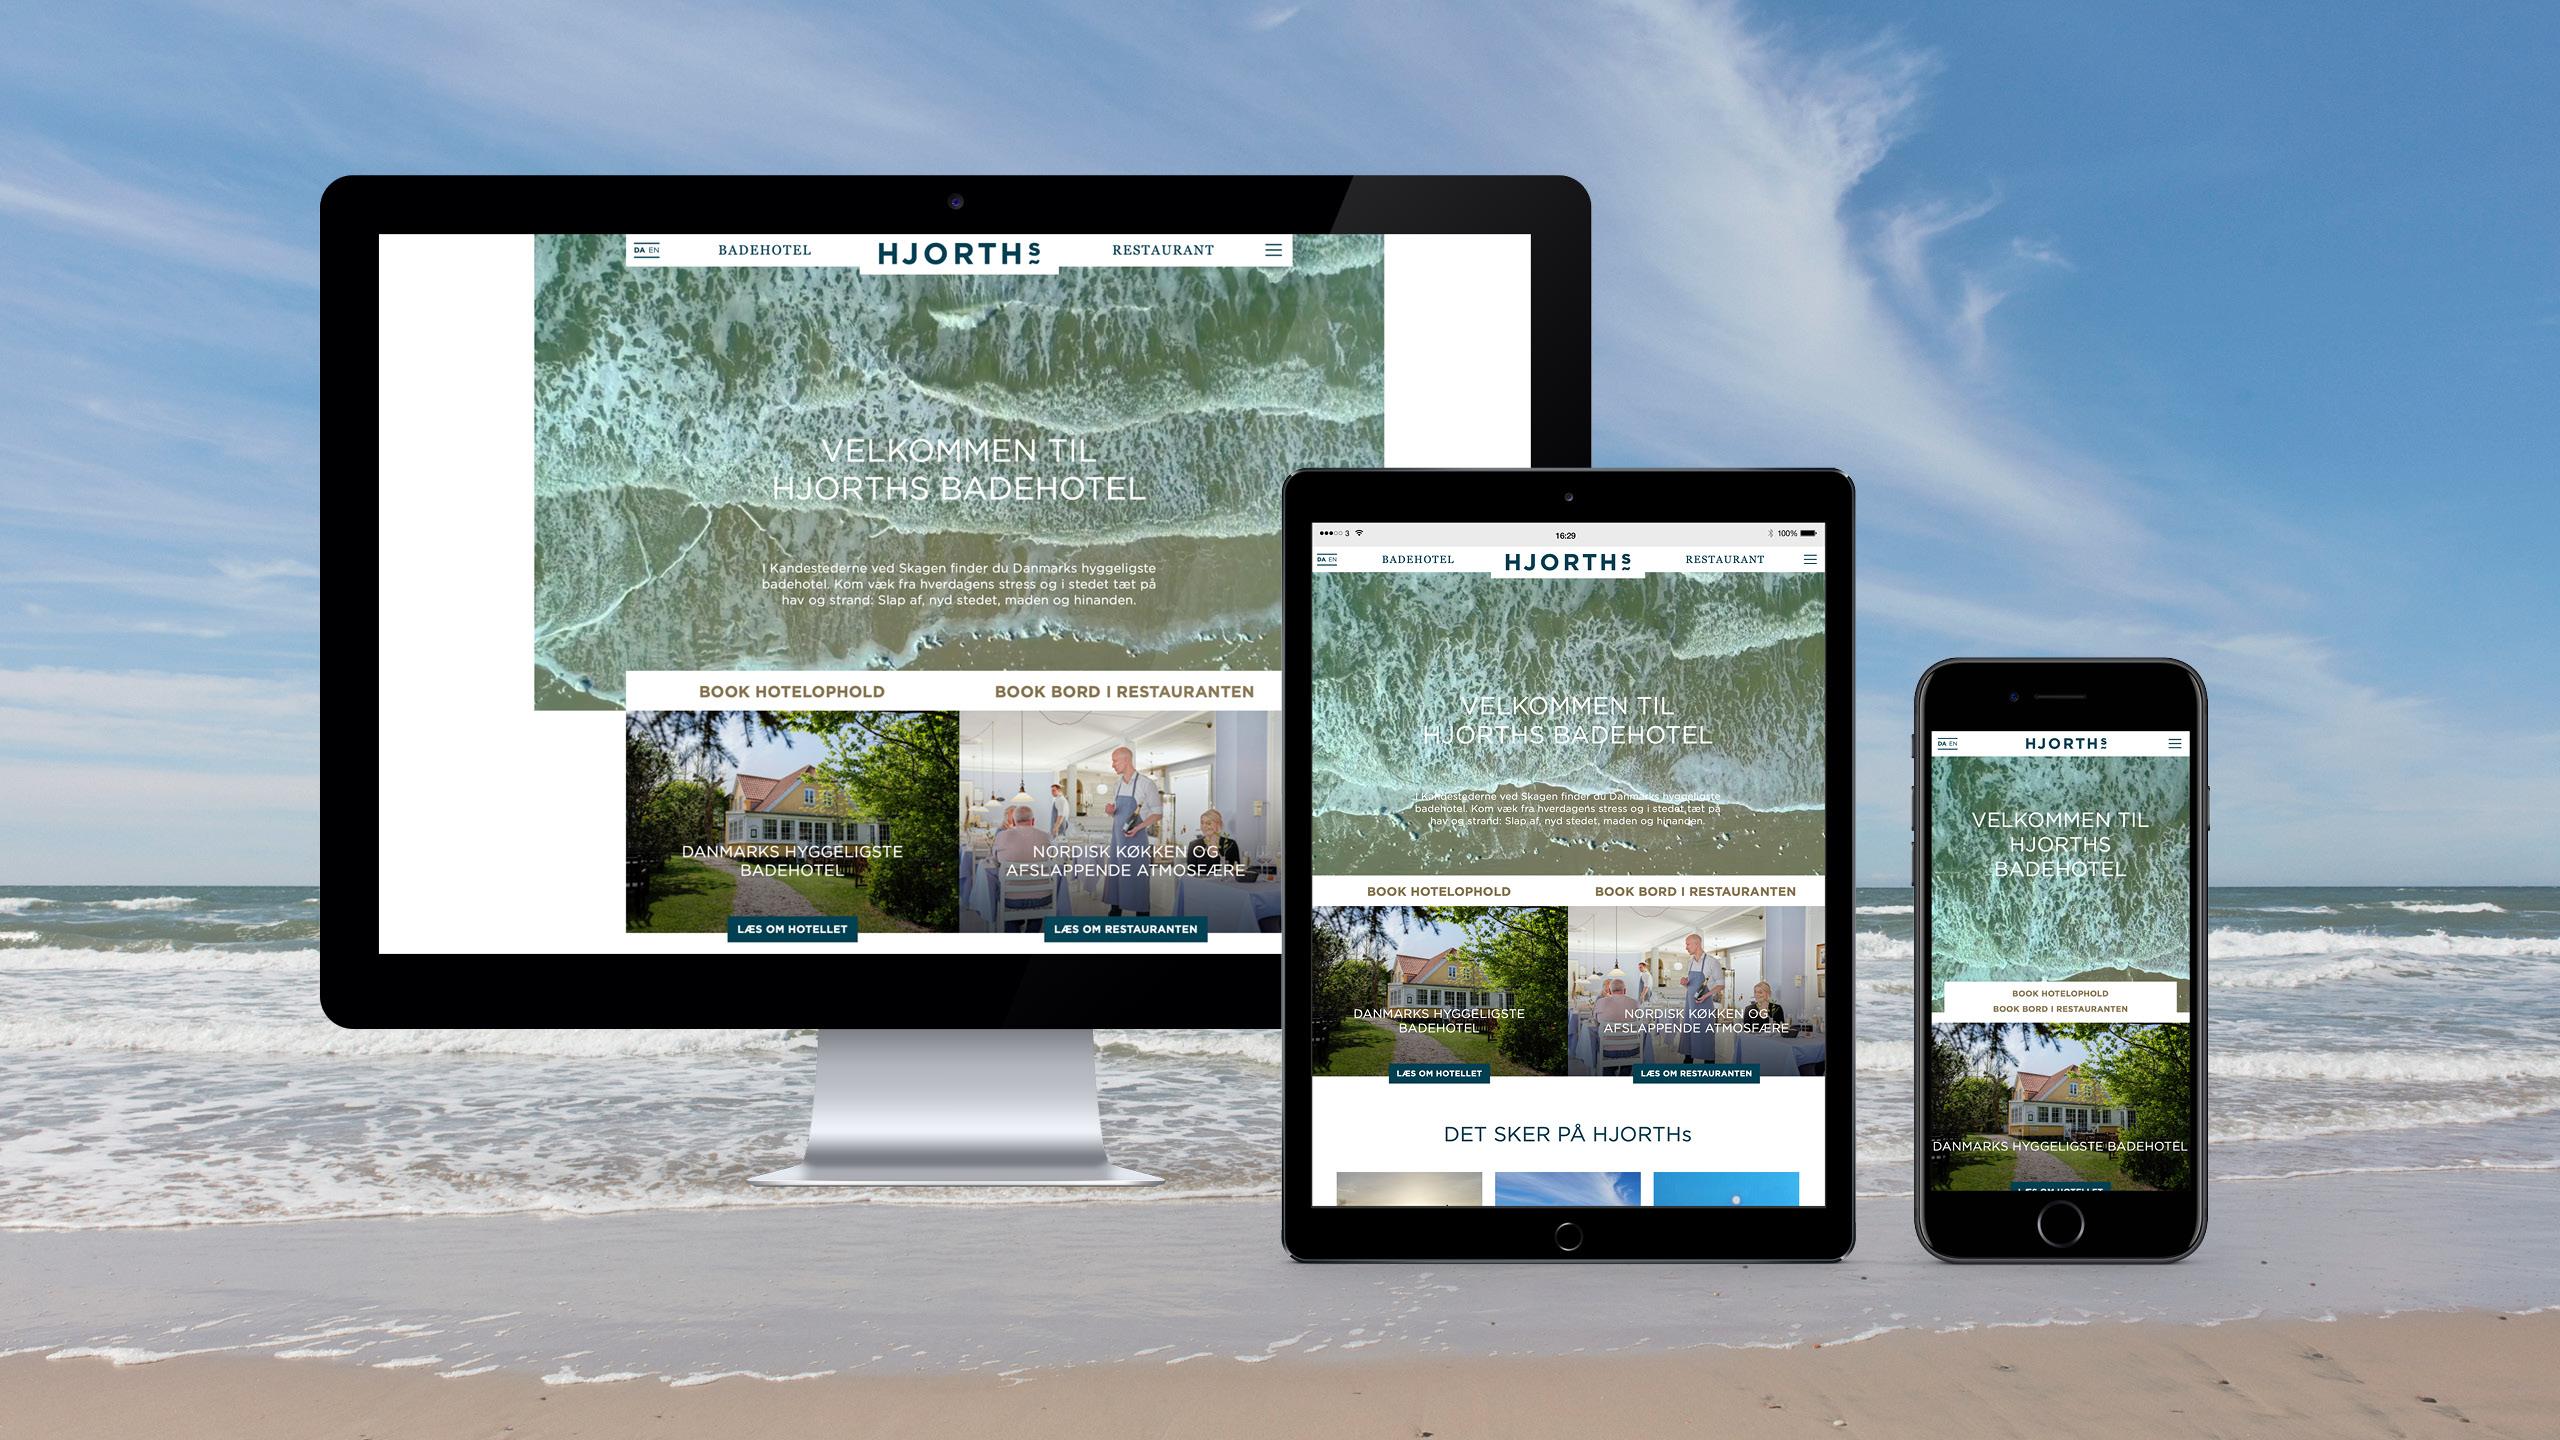 Stor_HJORTHs Badehotel_webdesign